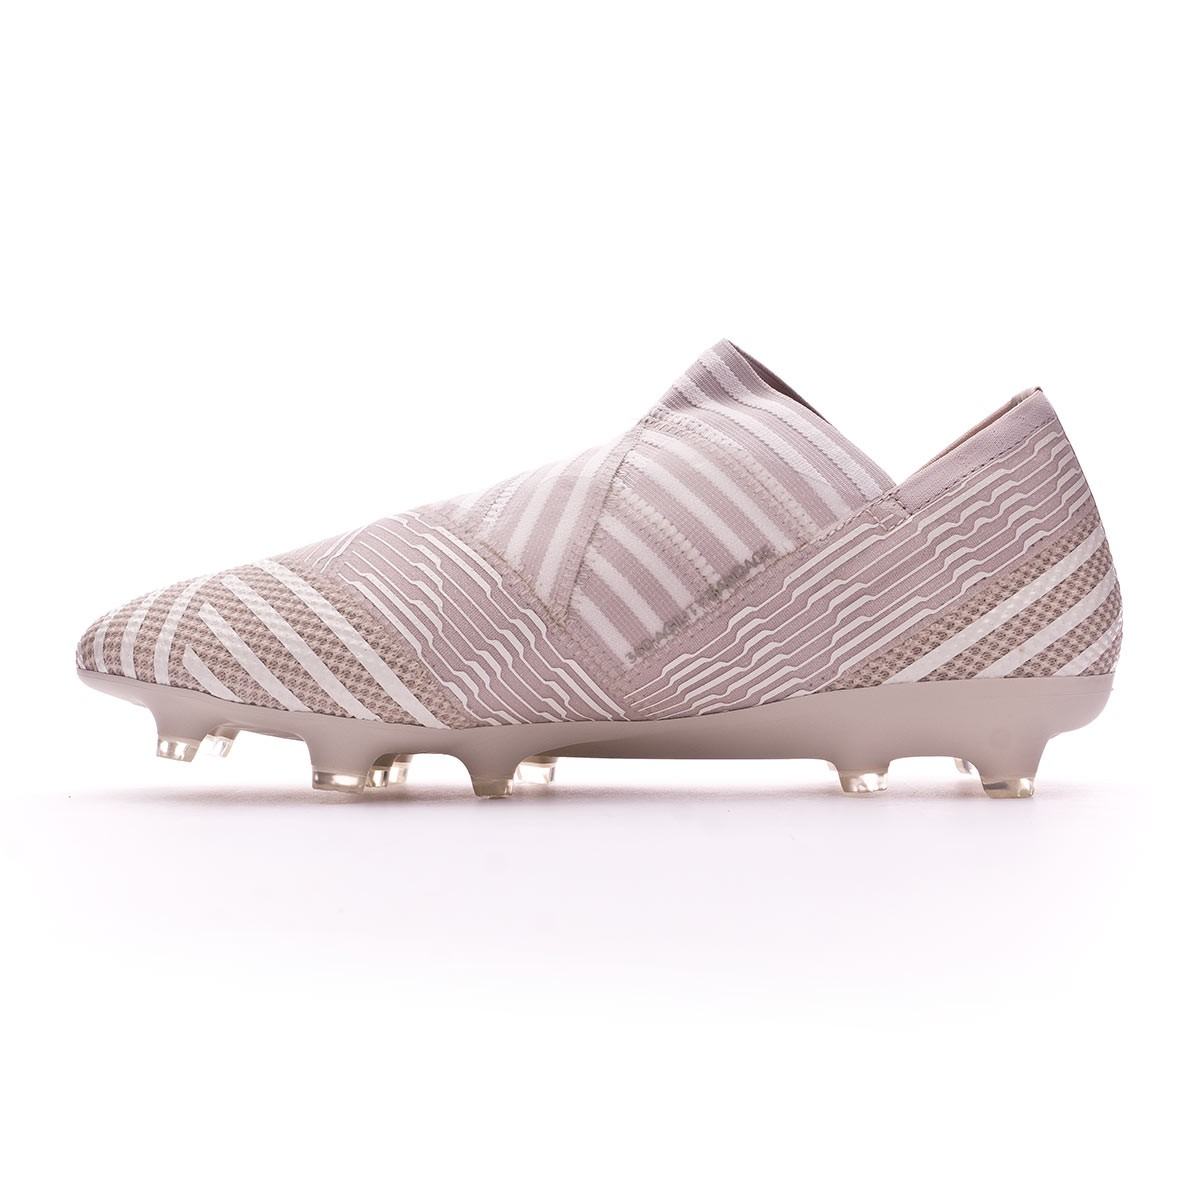 99d5d361e250 Football Boots adidas Nemeziz 17+ 360 Agility FG Clear Brown-Sesame-Chalk  white - Football store Fútbol Emotion